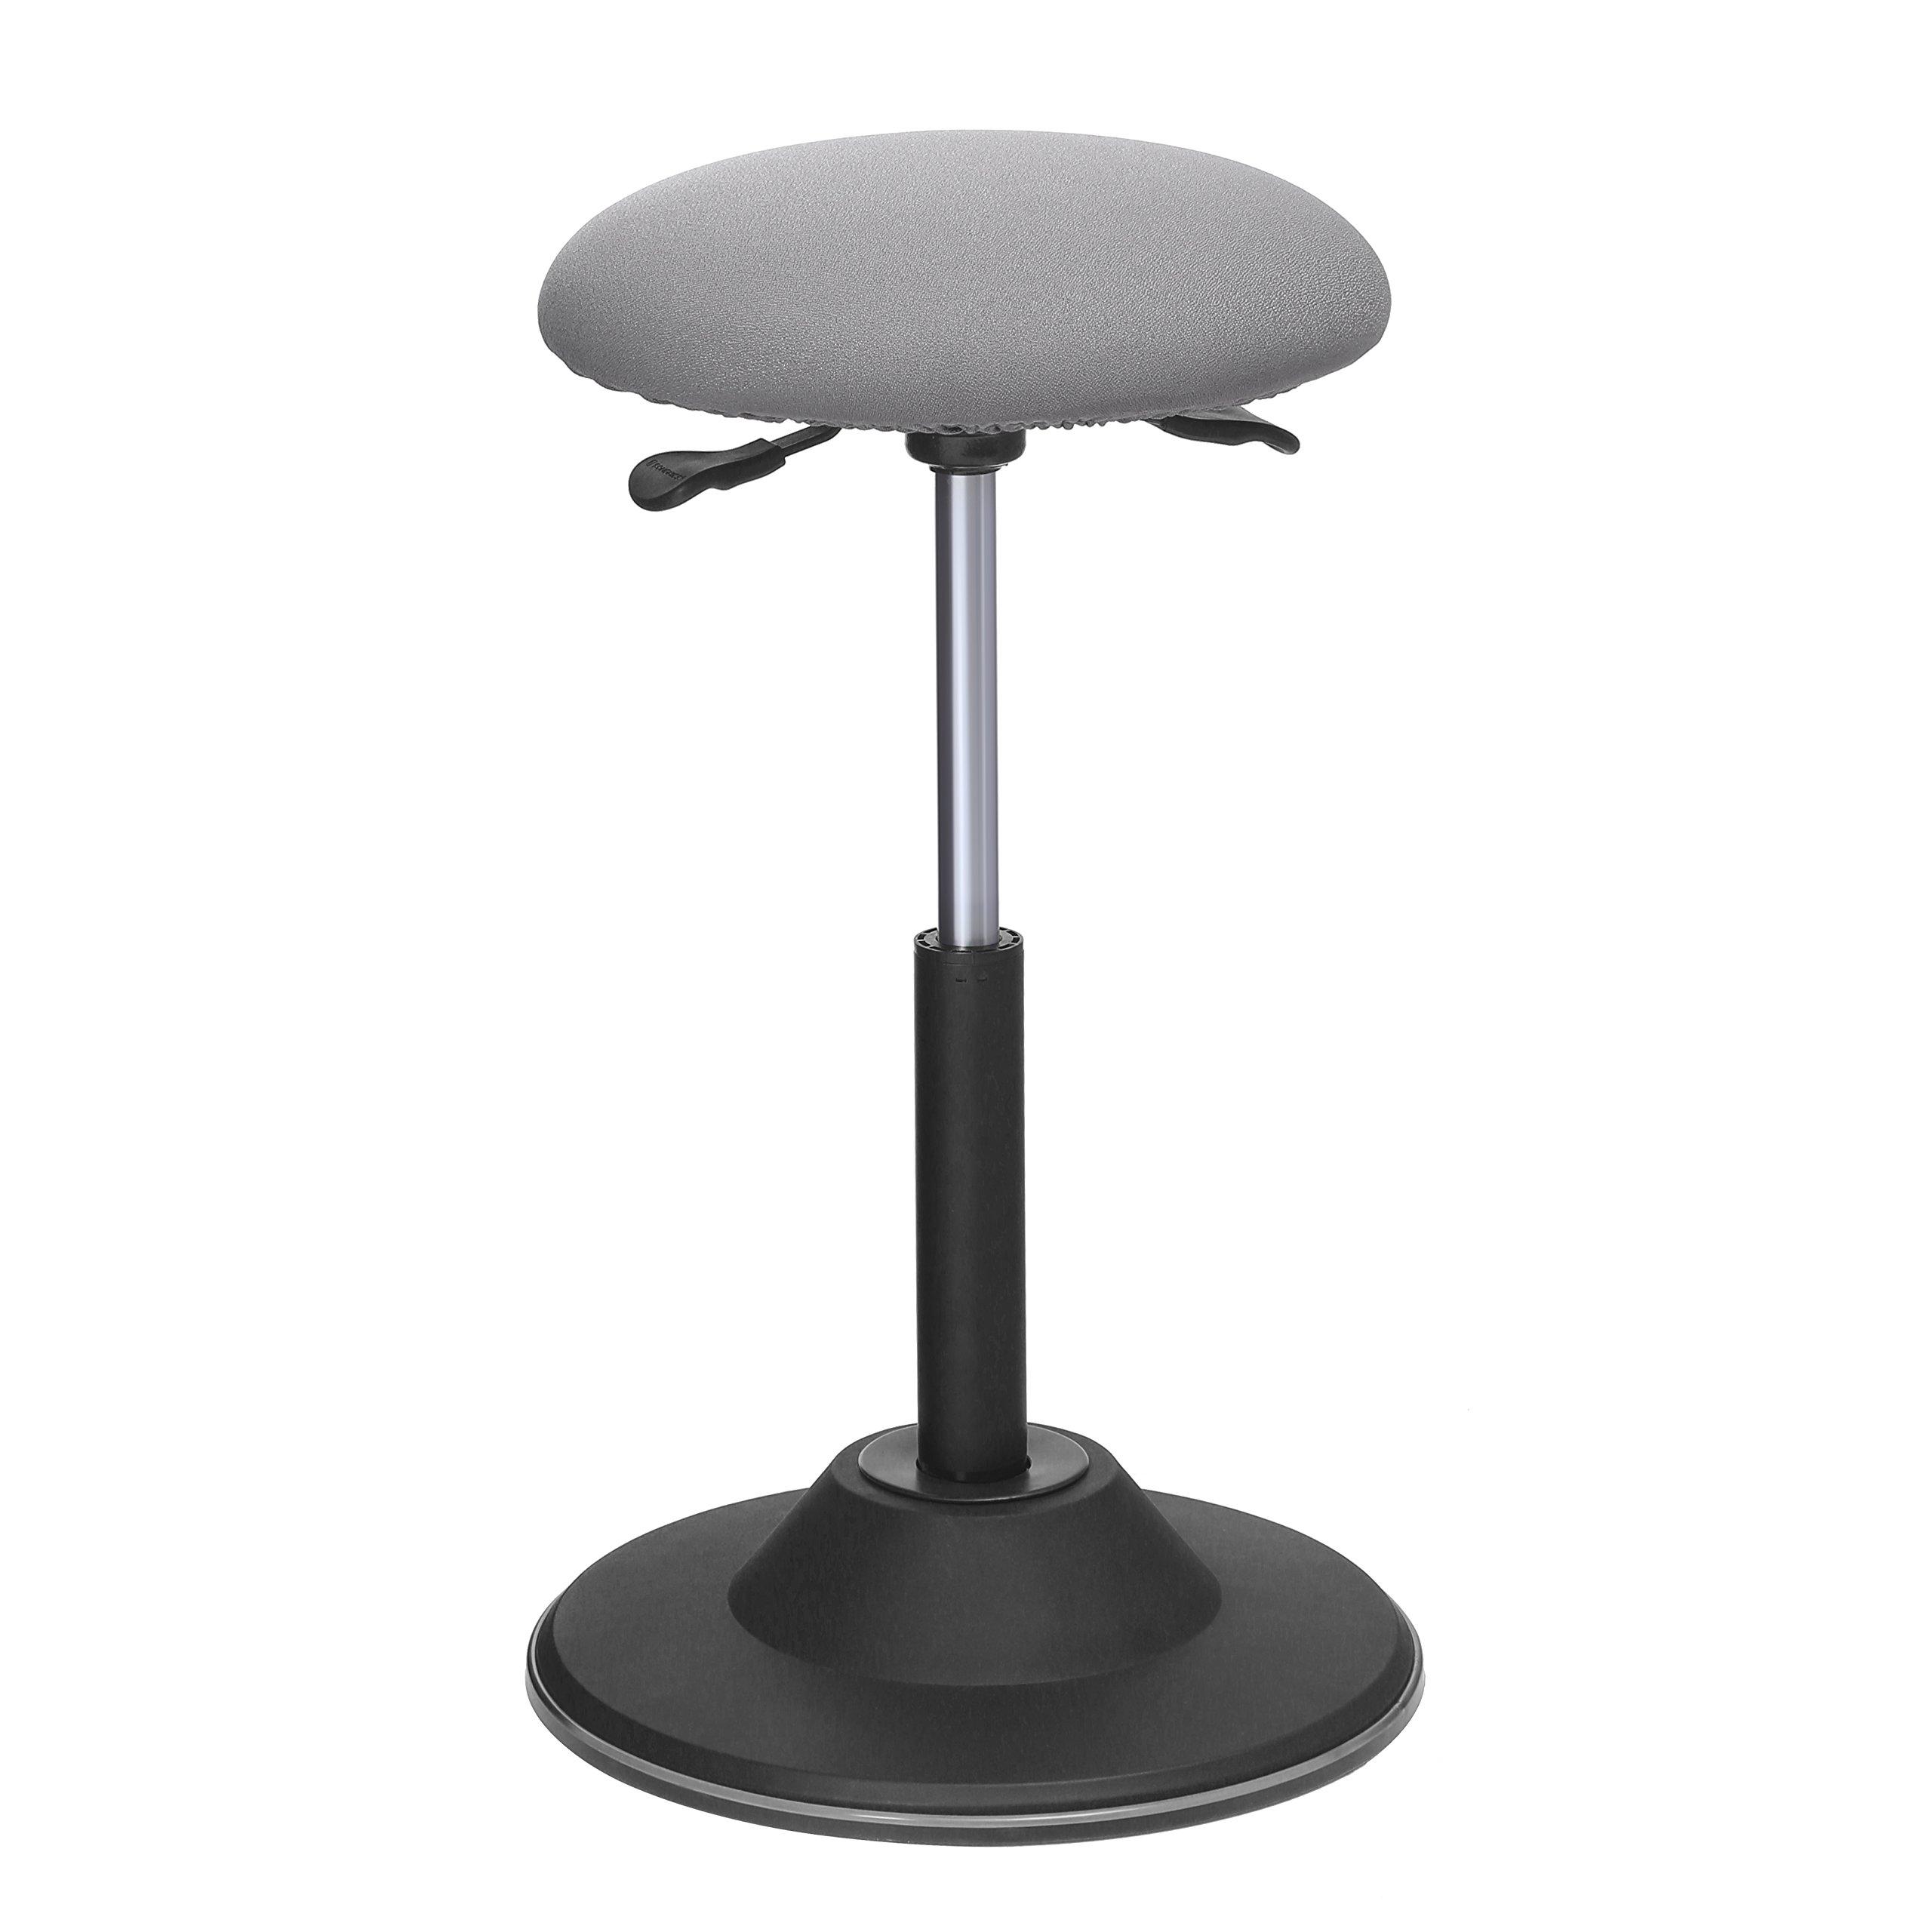 SONGMICS Standing Desk Chair, Adjustable Height Ergonomic Standing Stool, 360° Swivel Sitting Balance Chair, Gray UOSC01GY